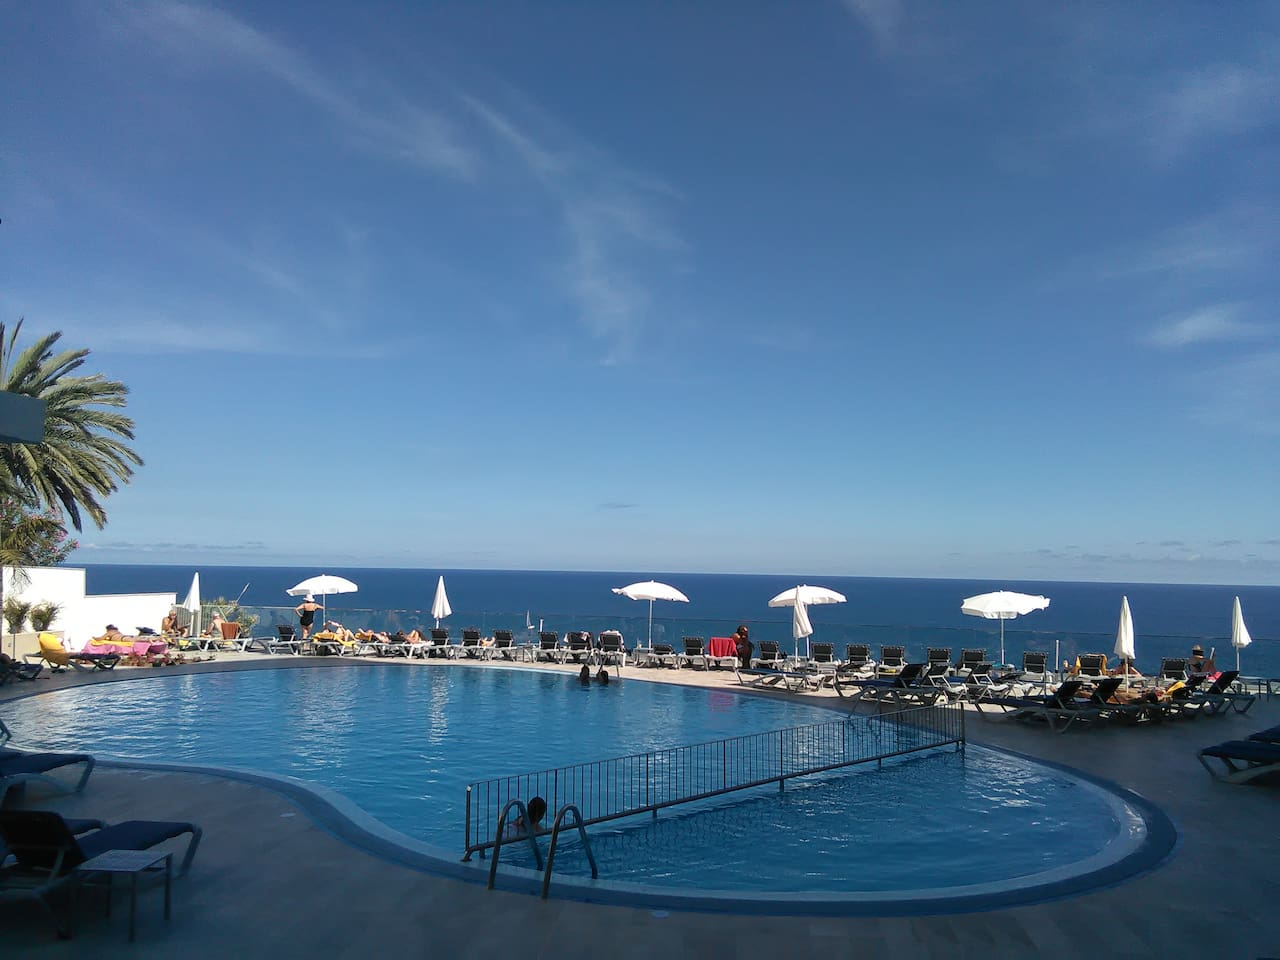 Amazing pool over the ocean